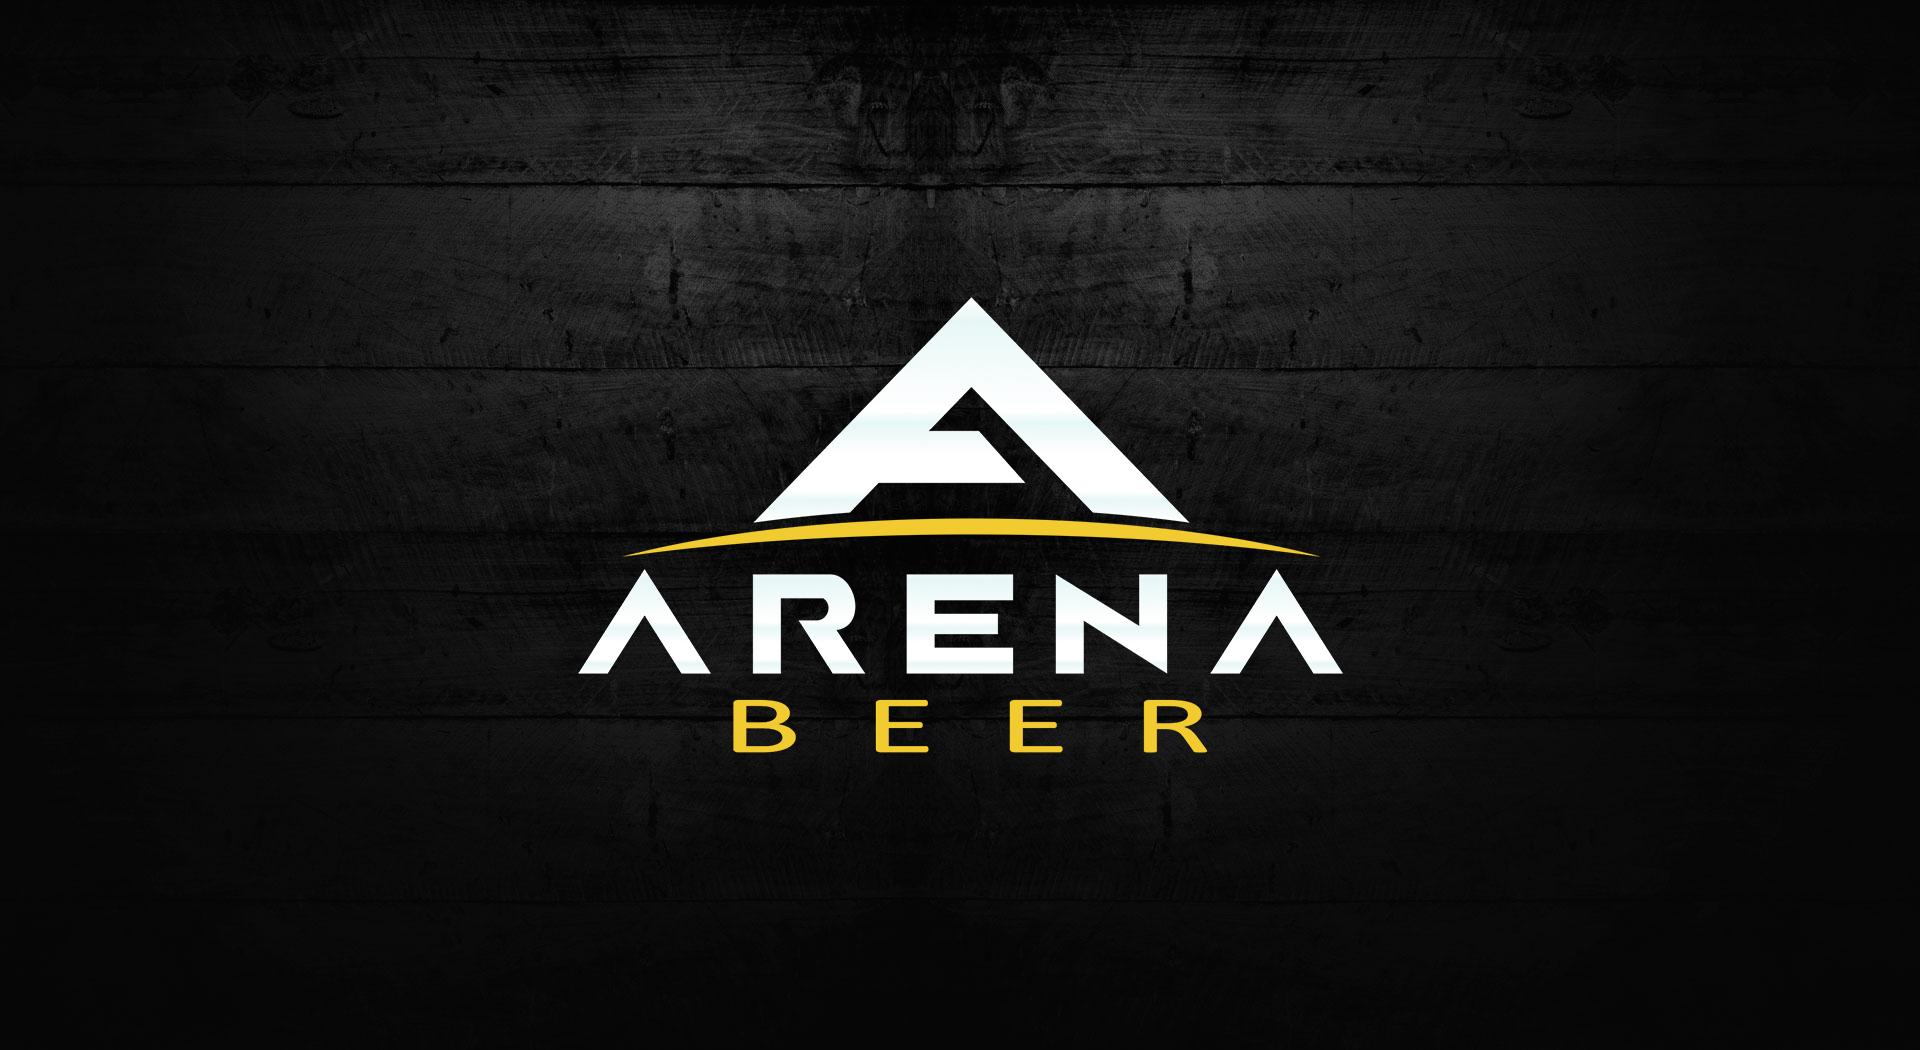 (c) Arenabeer.com.br